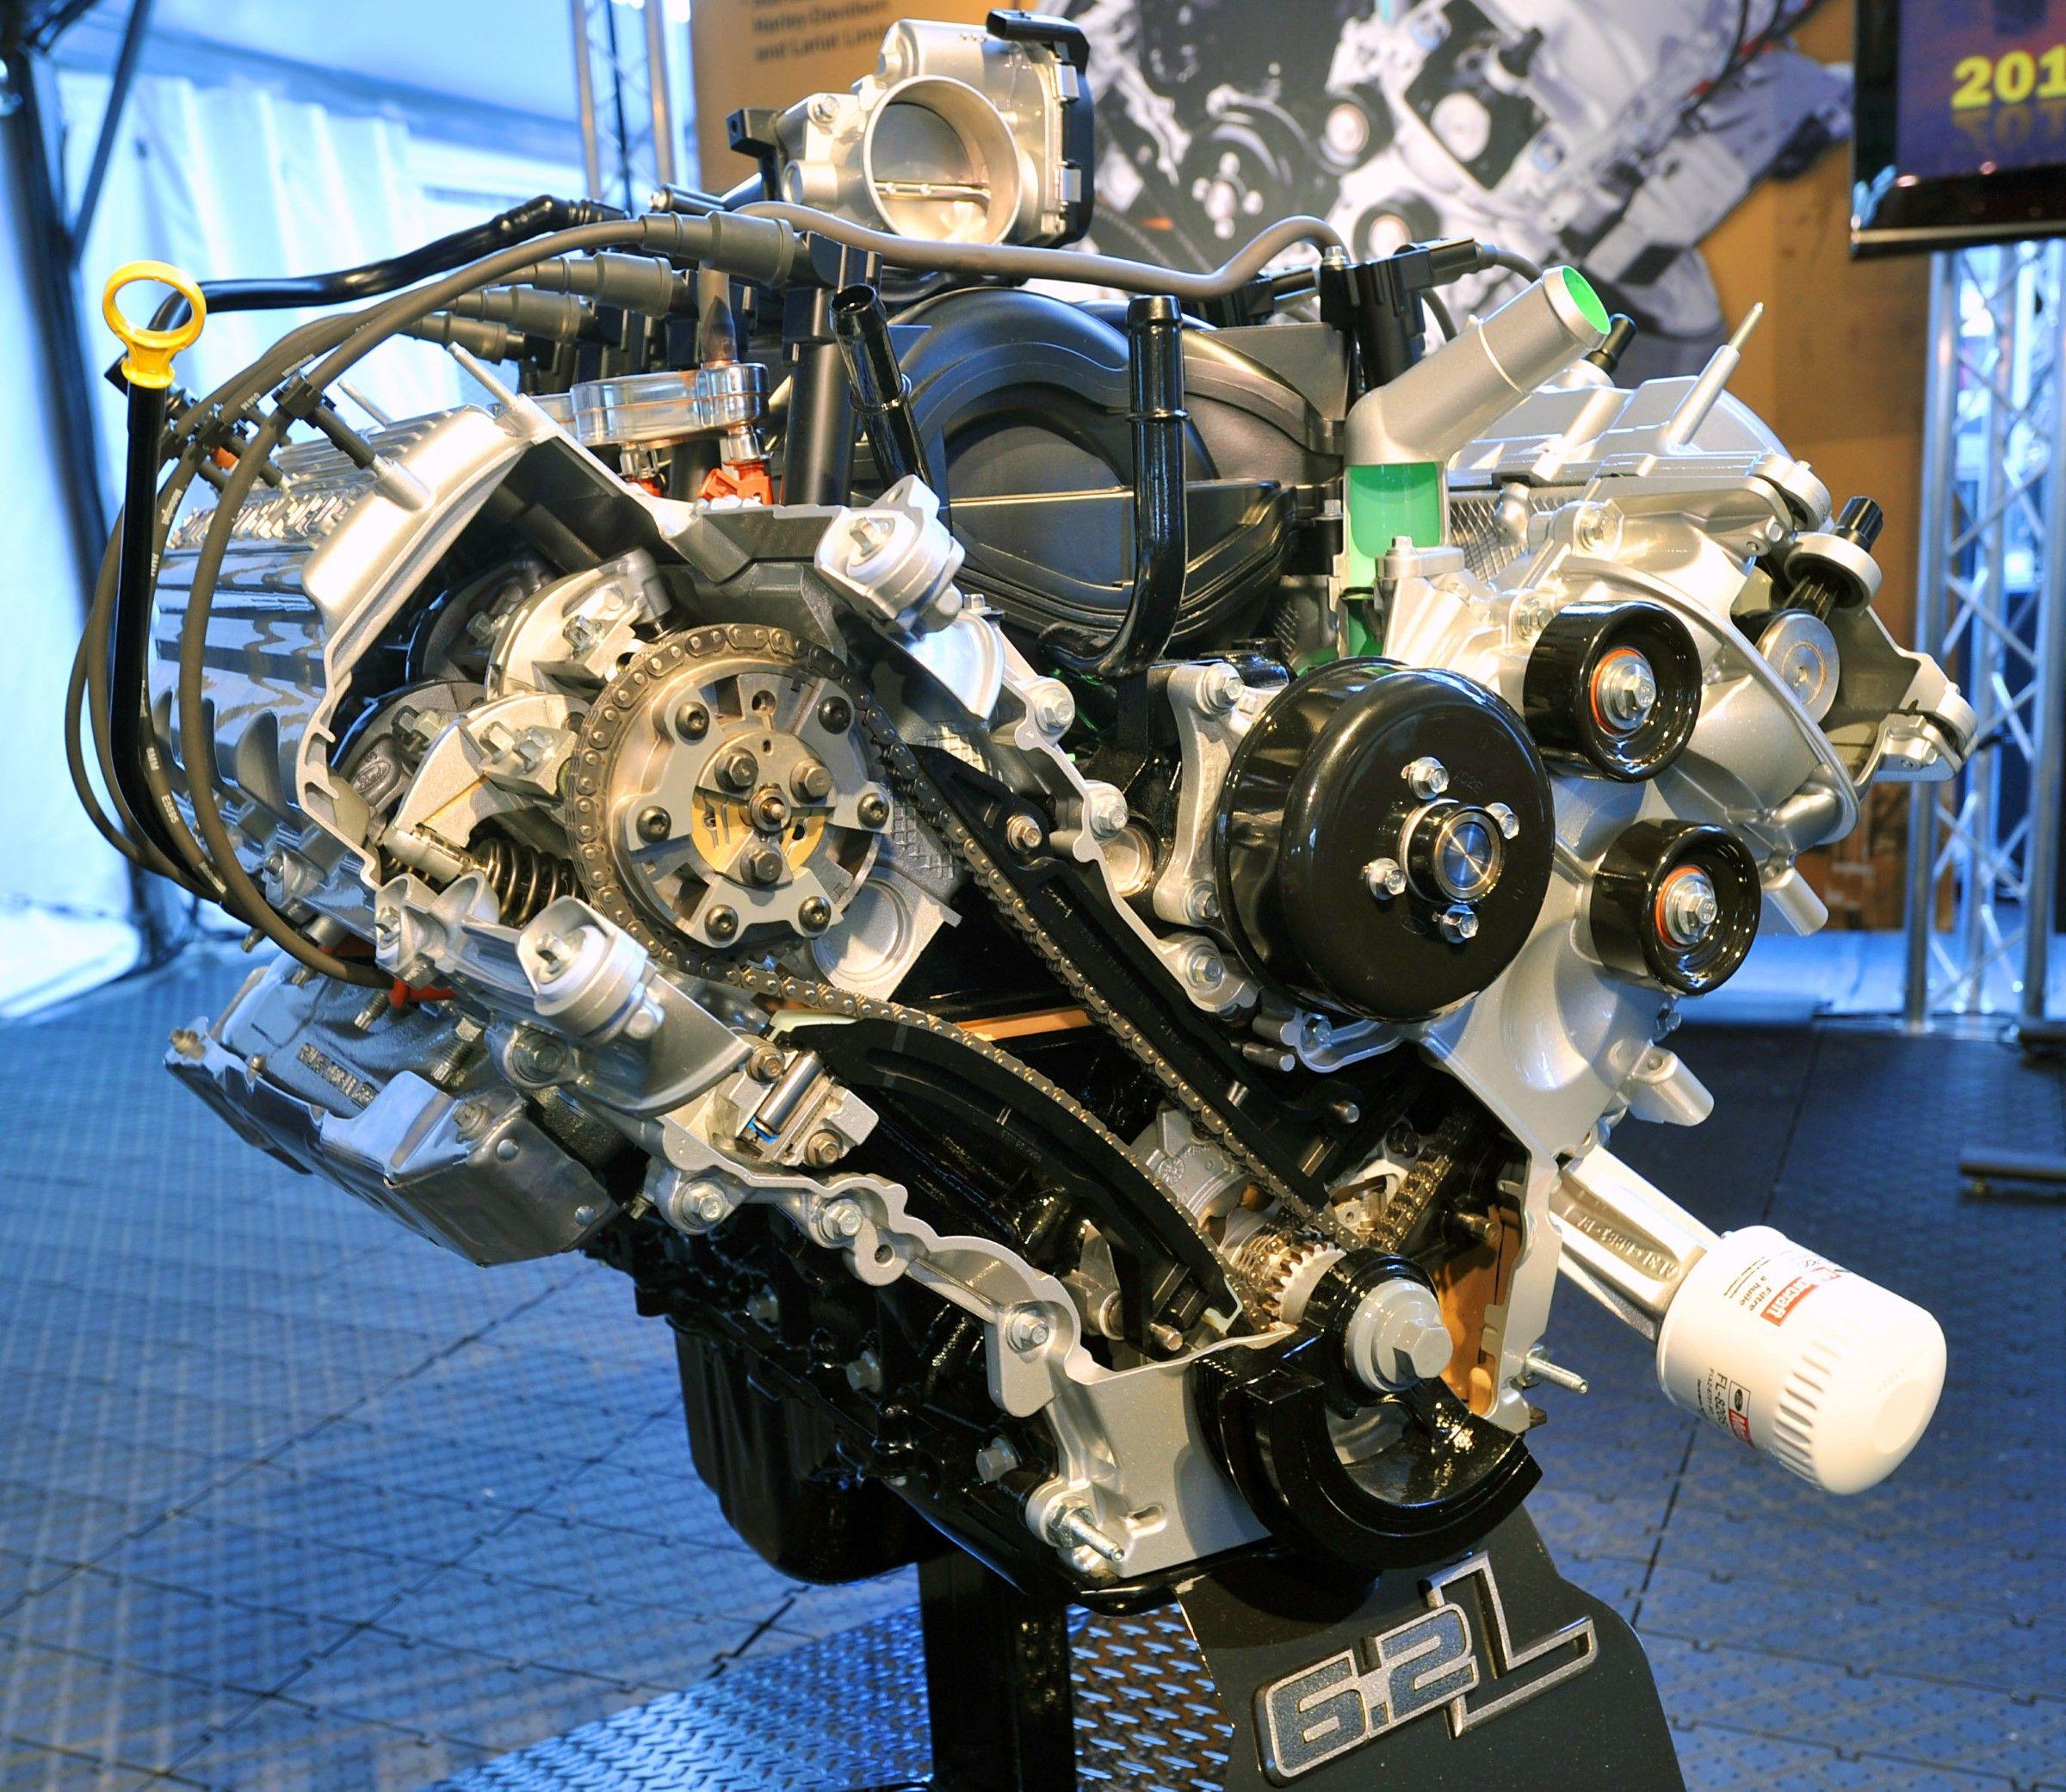 c153dc4e359377113d1b3454ed13e39a - How To Get More Power Out Of 6 2 Ford